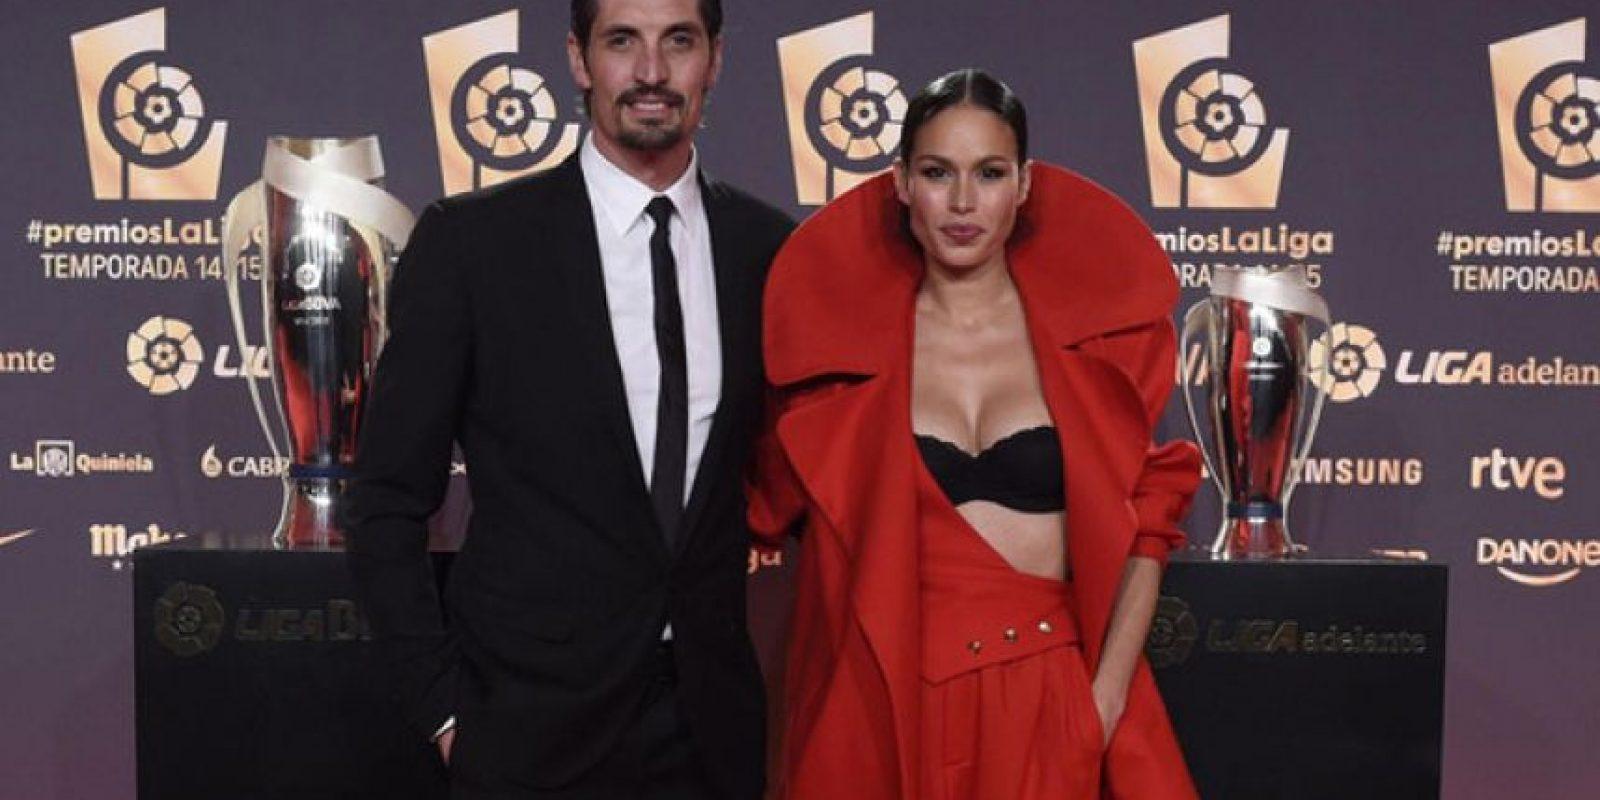 La modelo Mireia Canalda robó miradas al mostrar su sostén negro Foto:La LIga